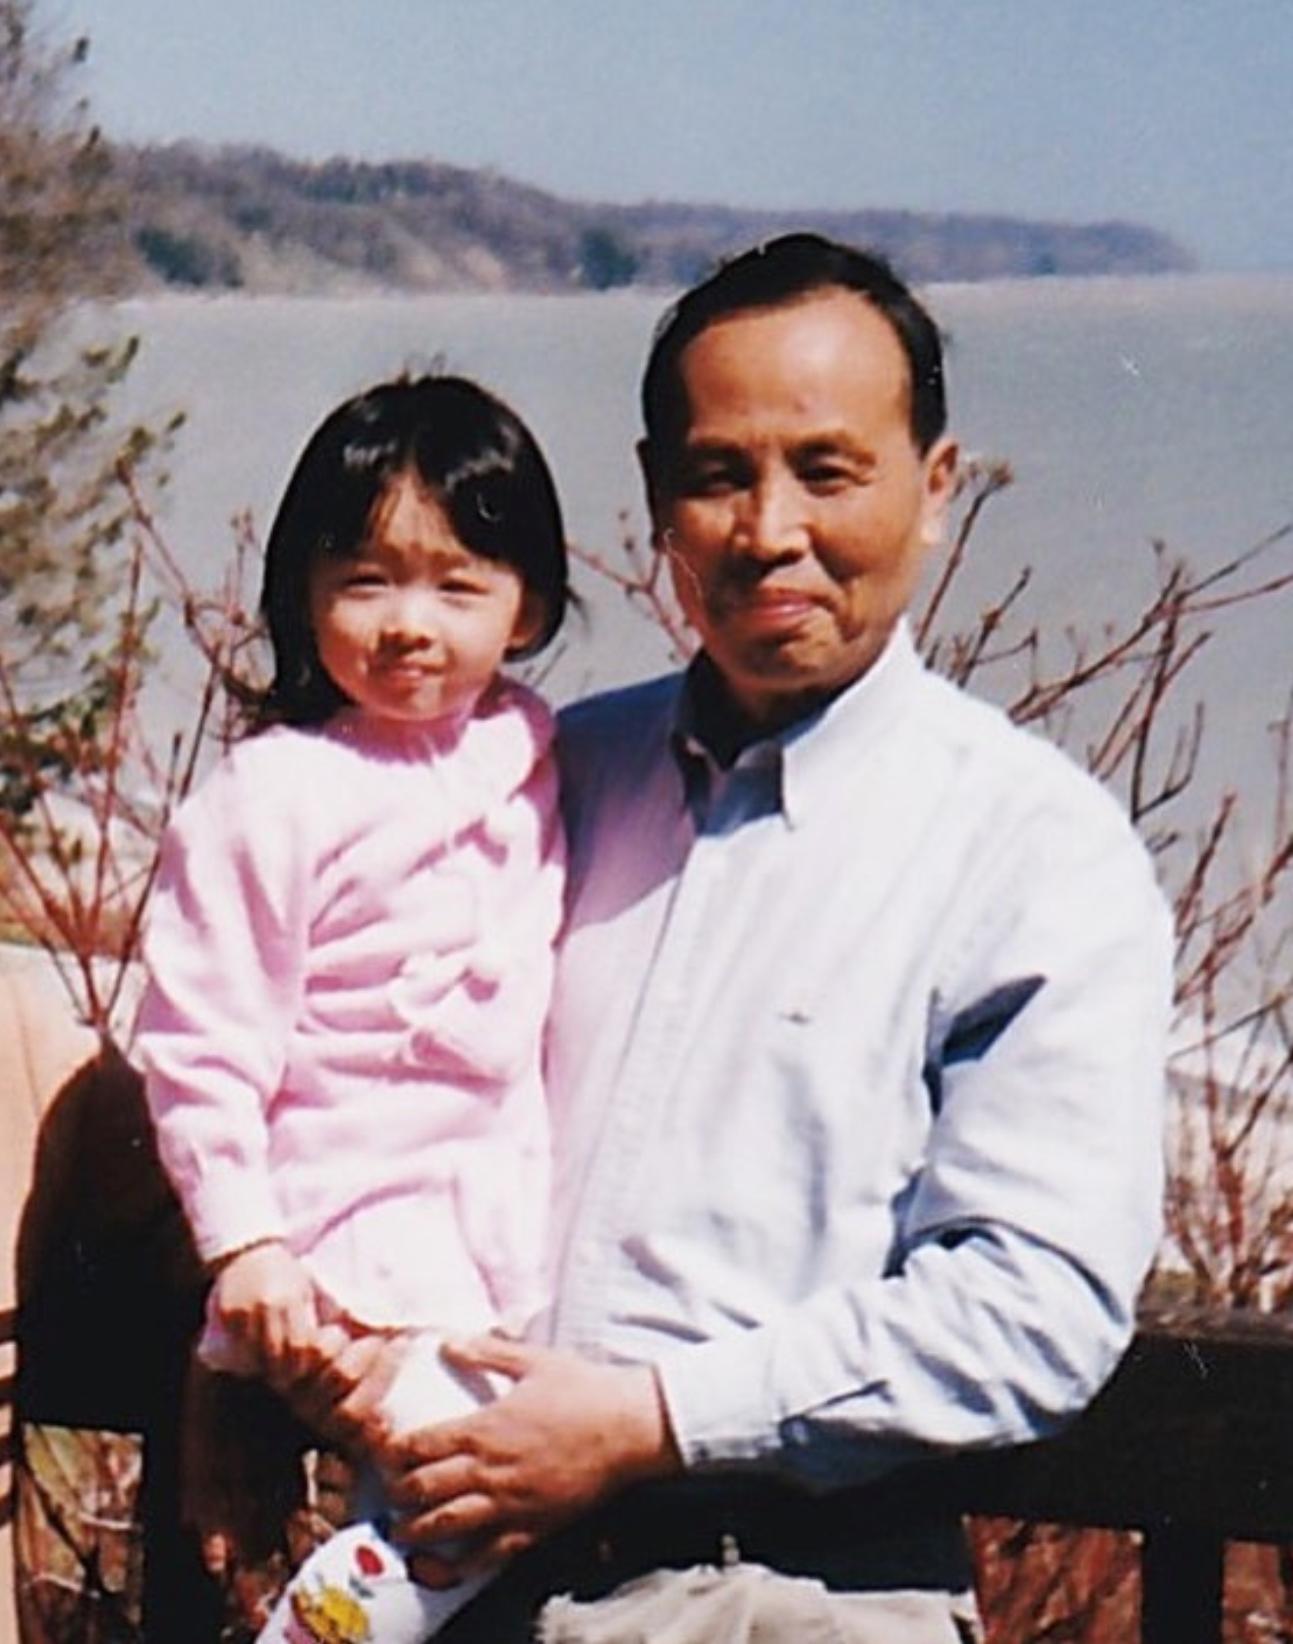 Me and my Yeye, circa 1998.